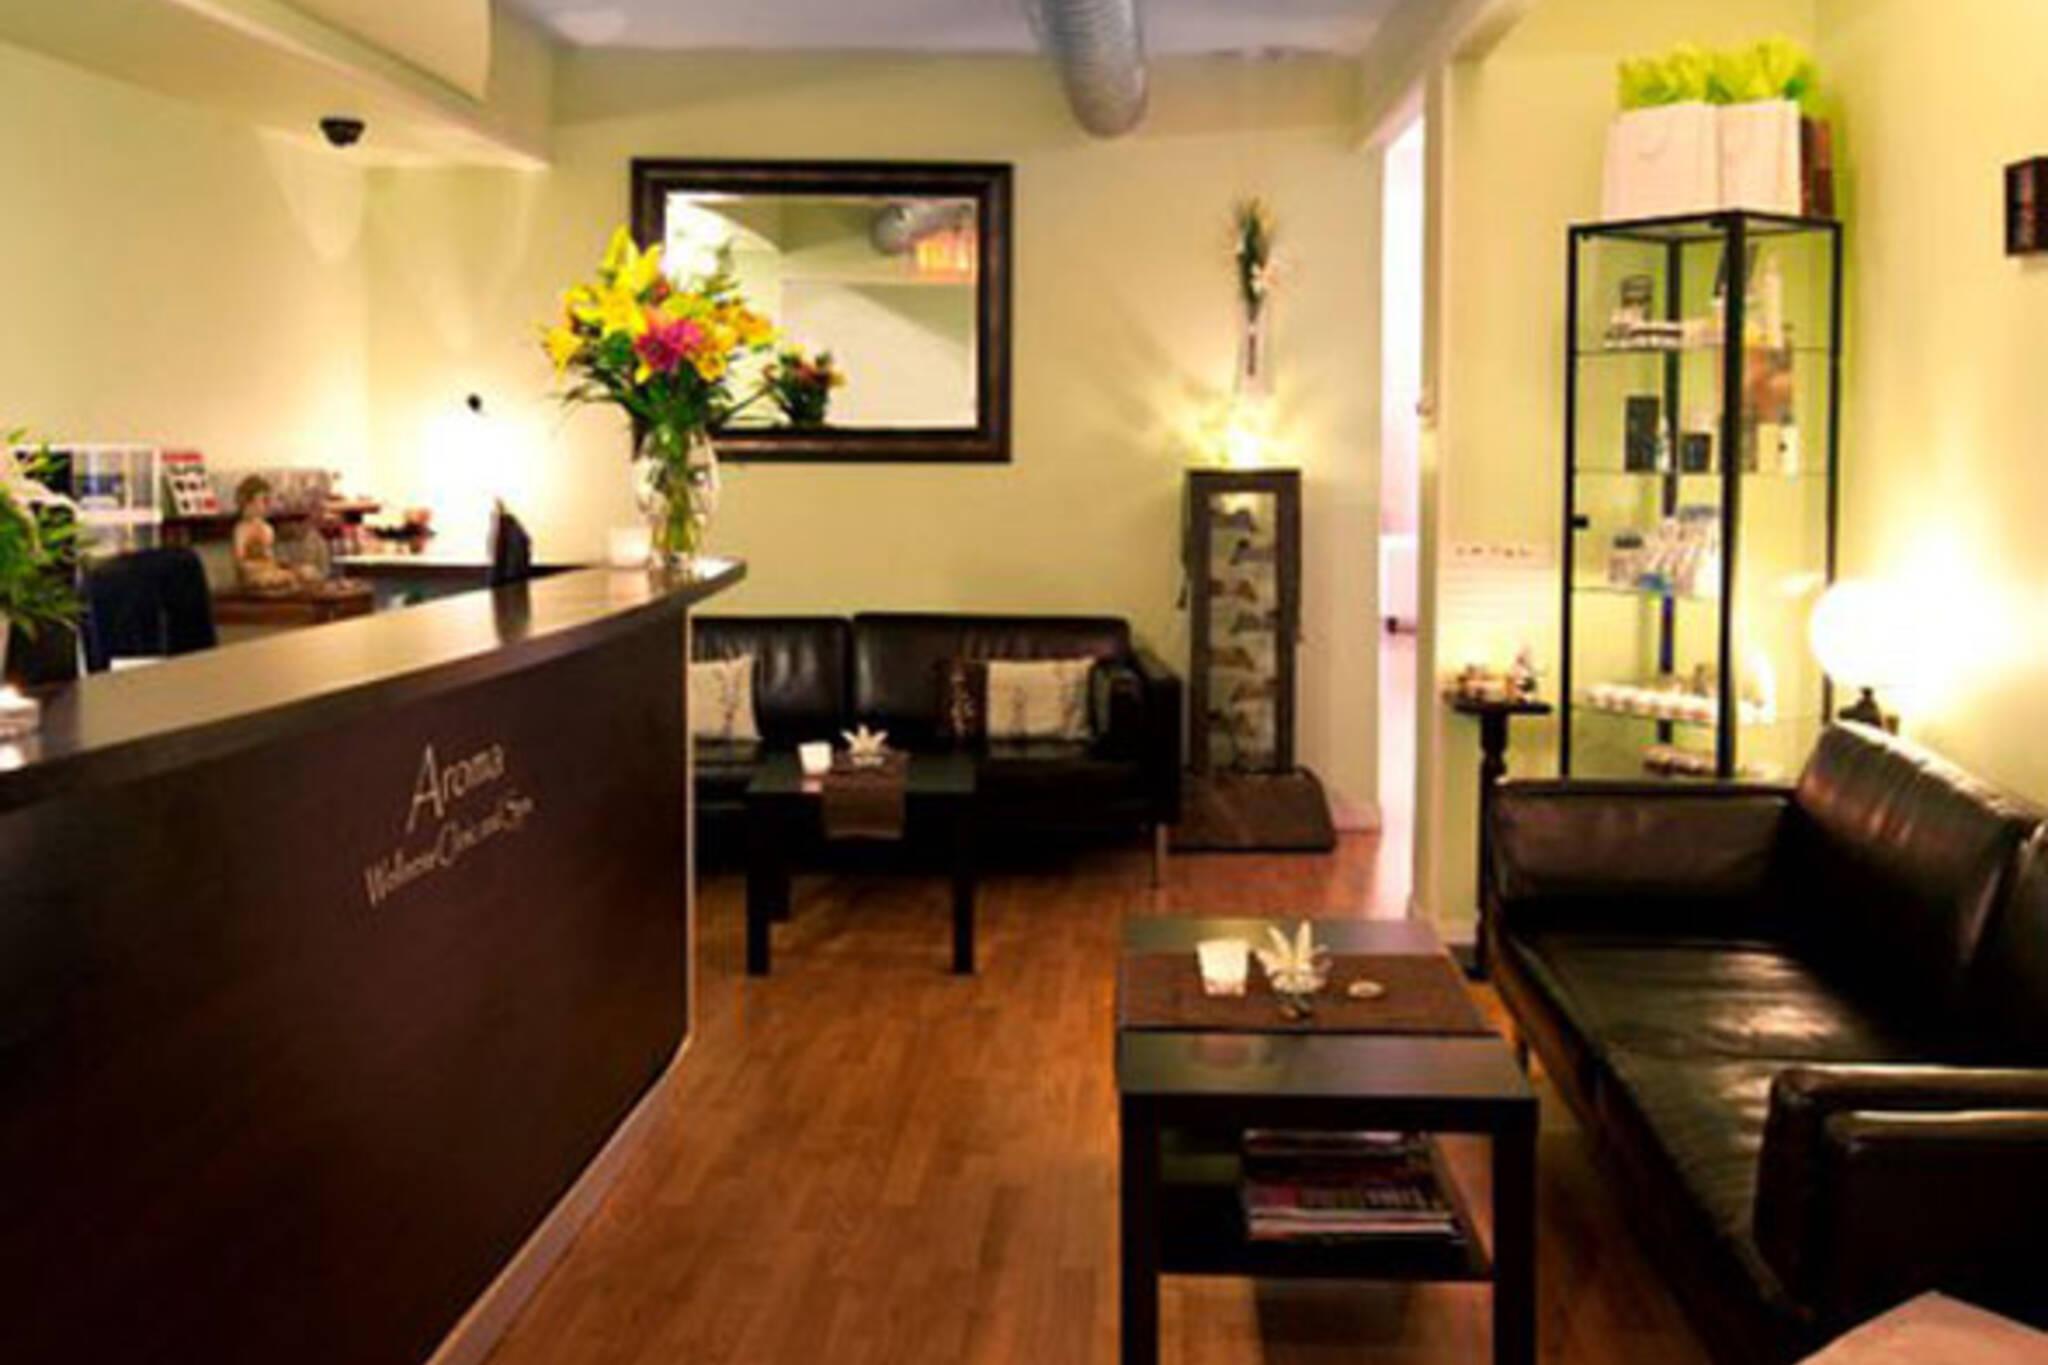 aroma wellness centre and spa